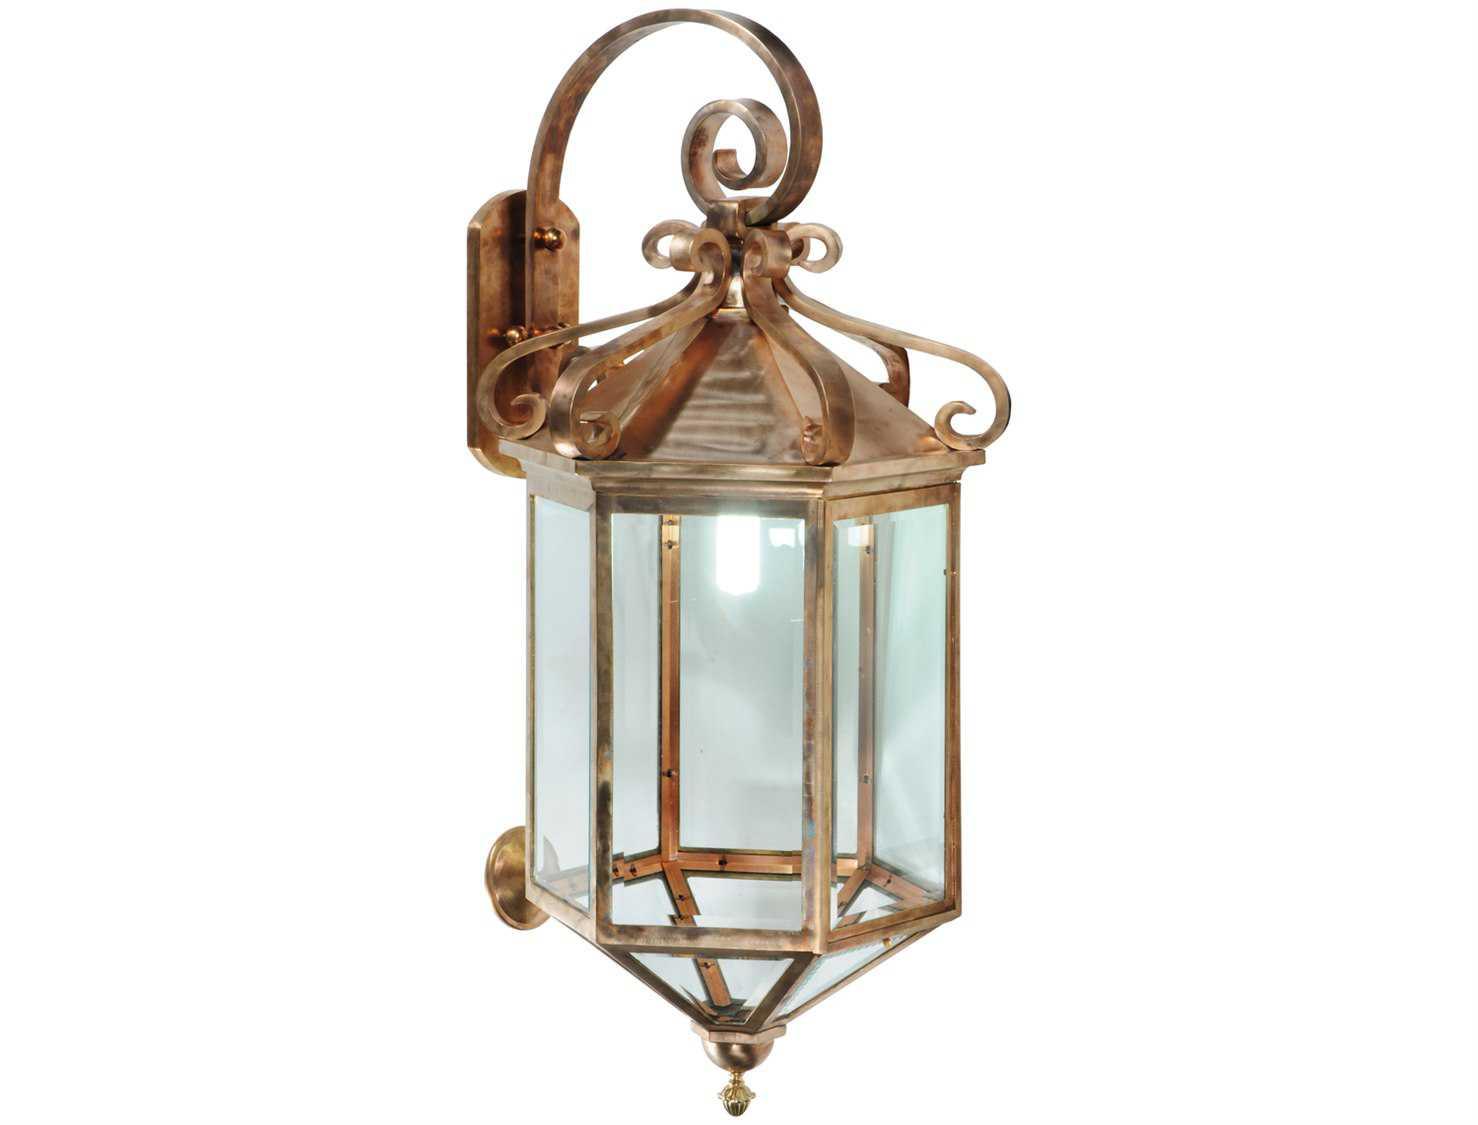 Meyda Tiffany Anza Lantern Outdoor Wall Light 122800